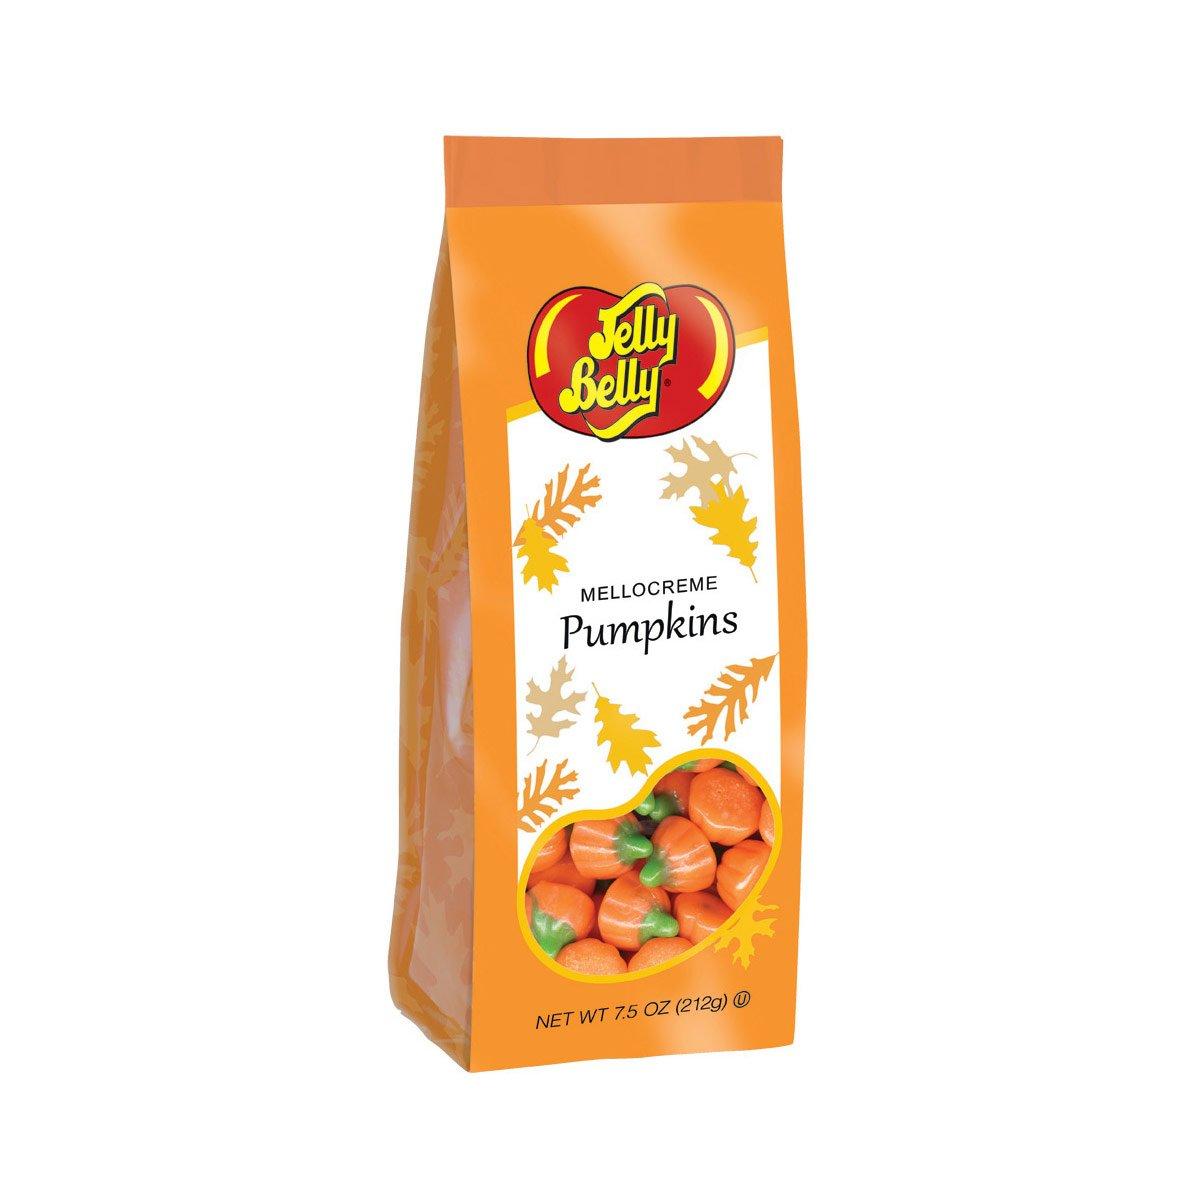 Mellocreme Pumpkins Gift Bag - 7.5 oz Bag